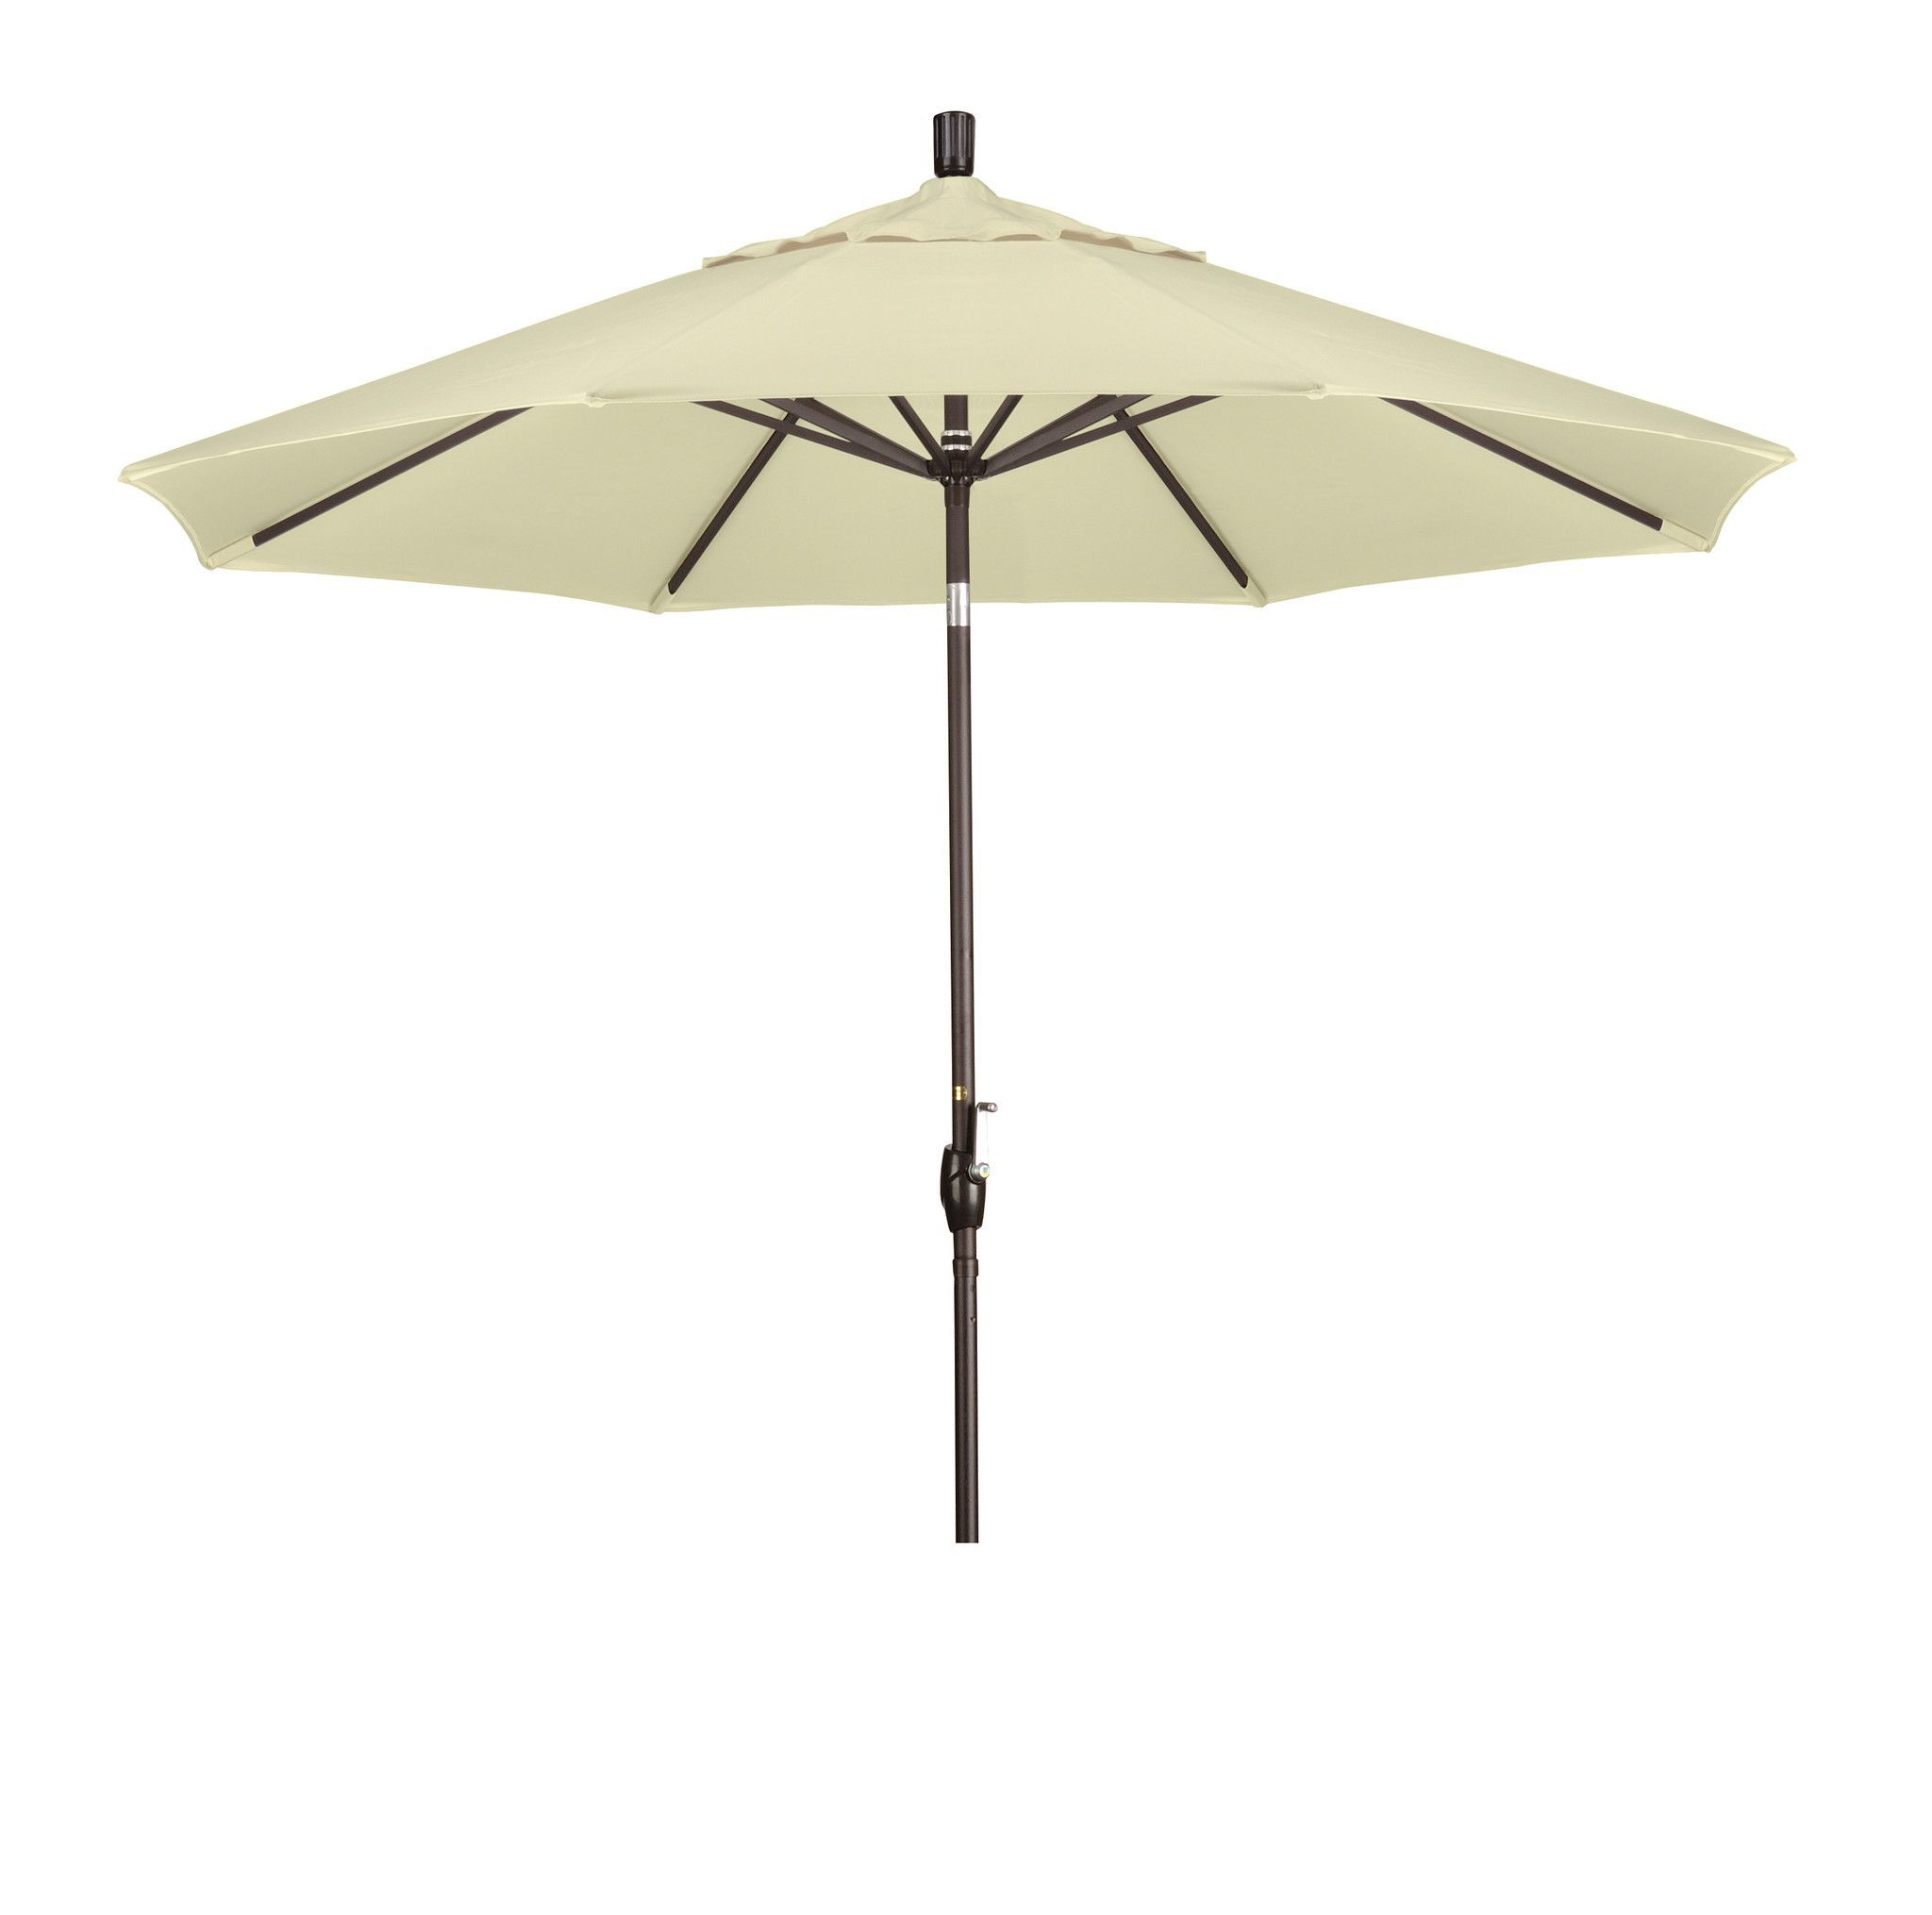 Eclipse Collection 9' Aluminum Market Umbrella Push Tilt - Bronze/Pacifica/Natural